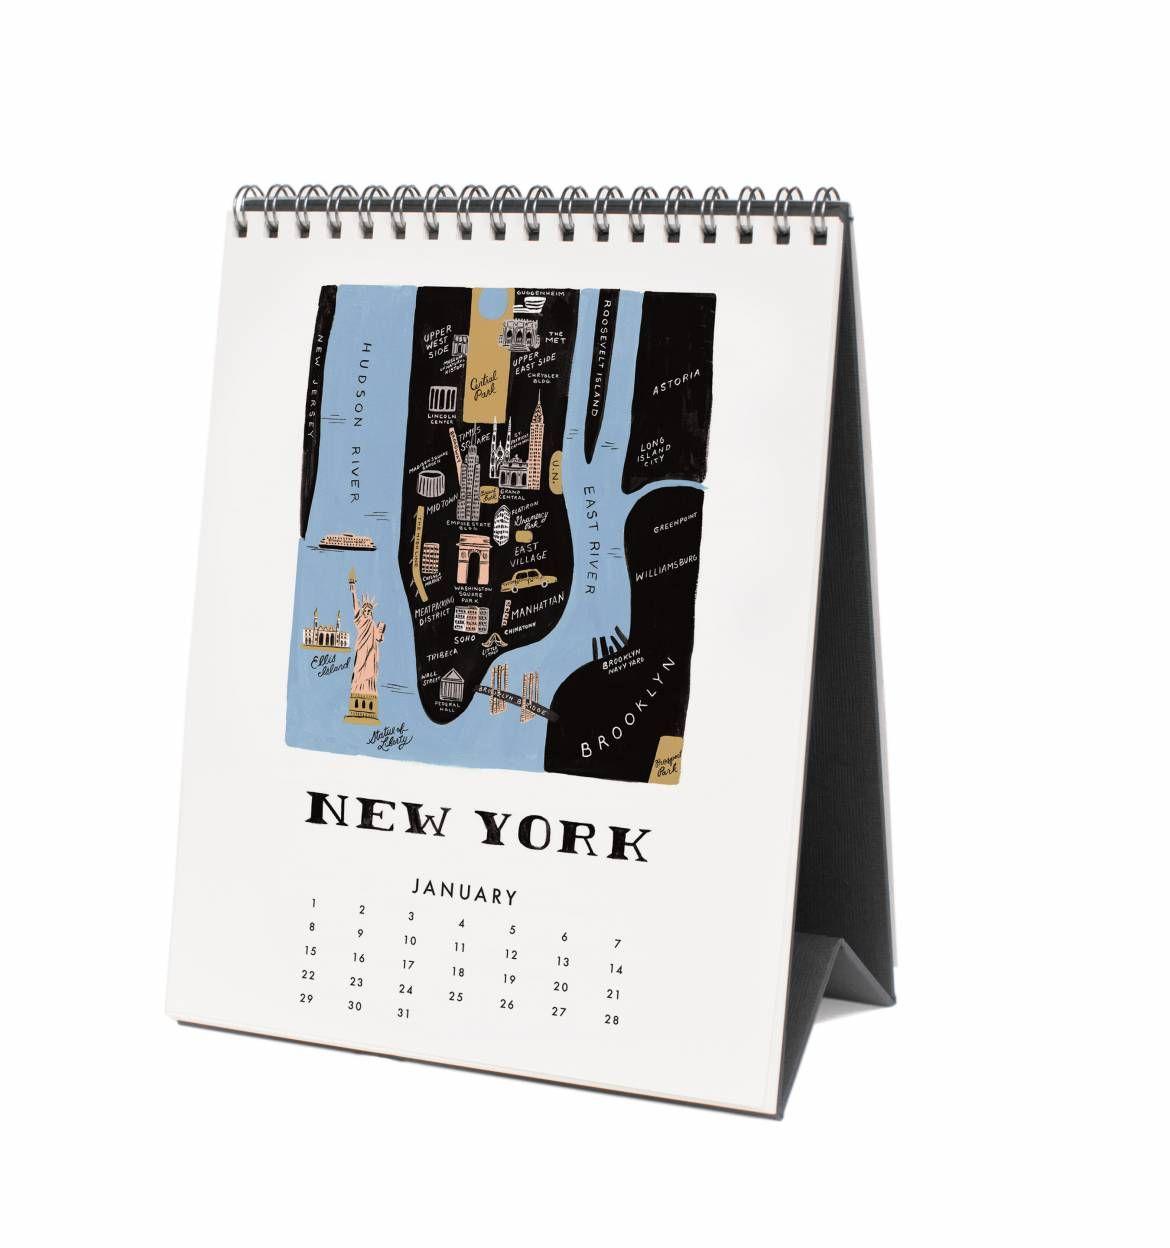 2017 maps desk calendar pinterest desk calendars and desks 2017 maps desk calendar by rifle paper co made in usa gumiabroncs Gallery